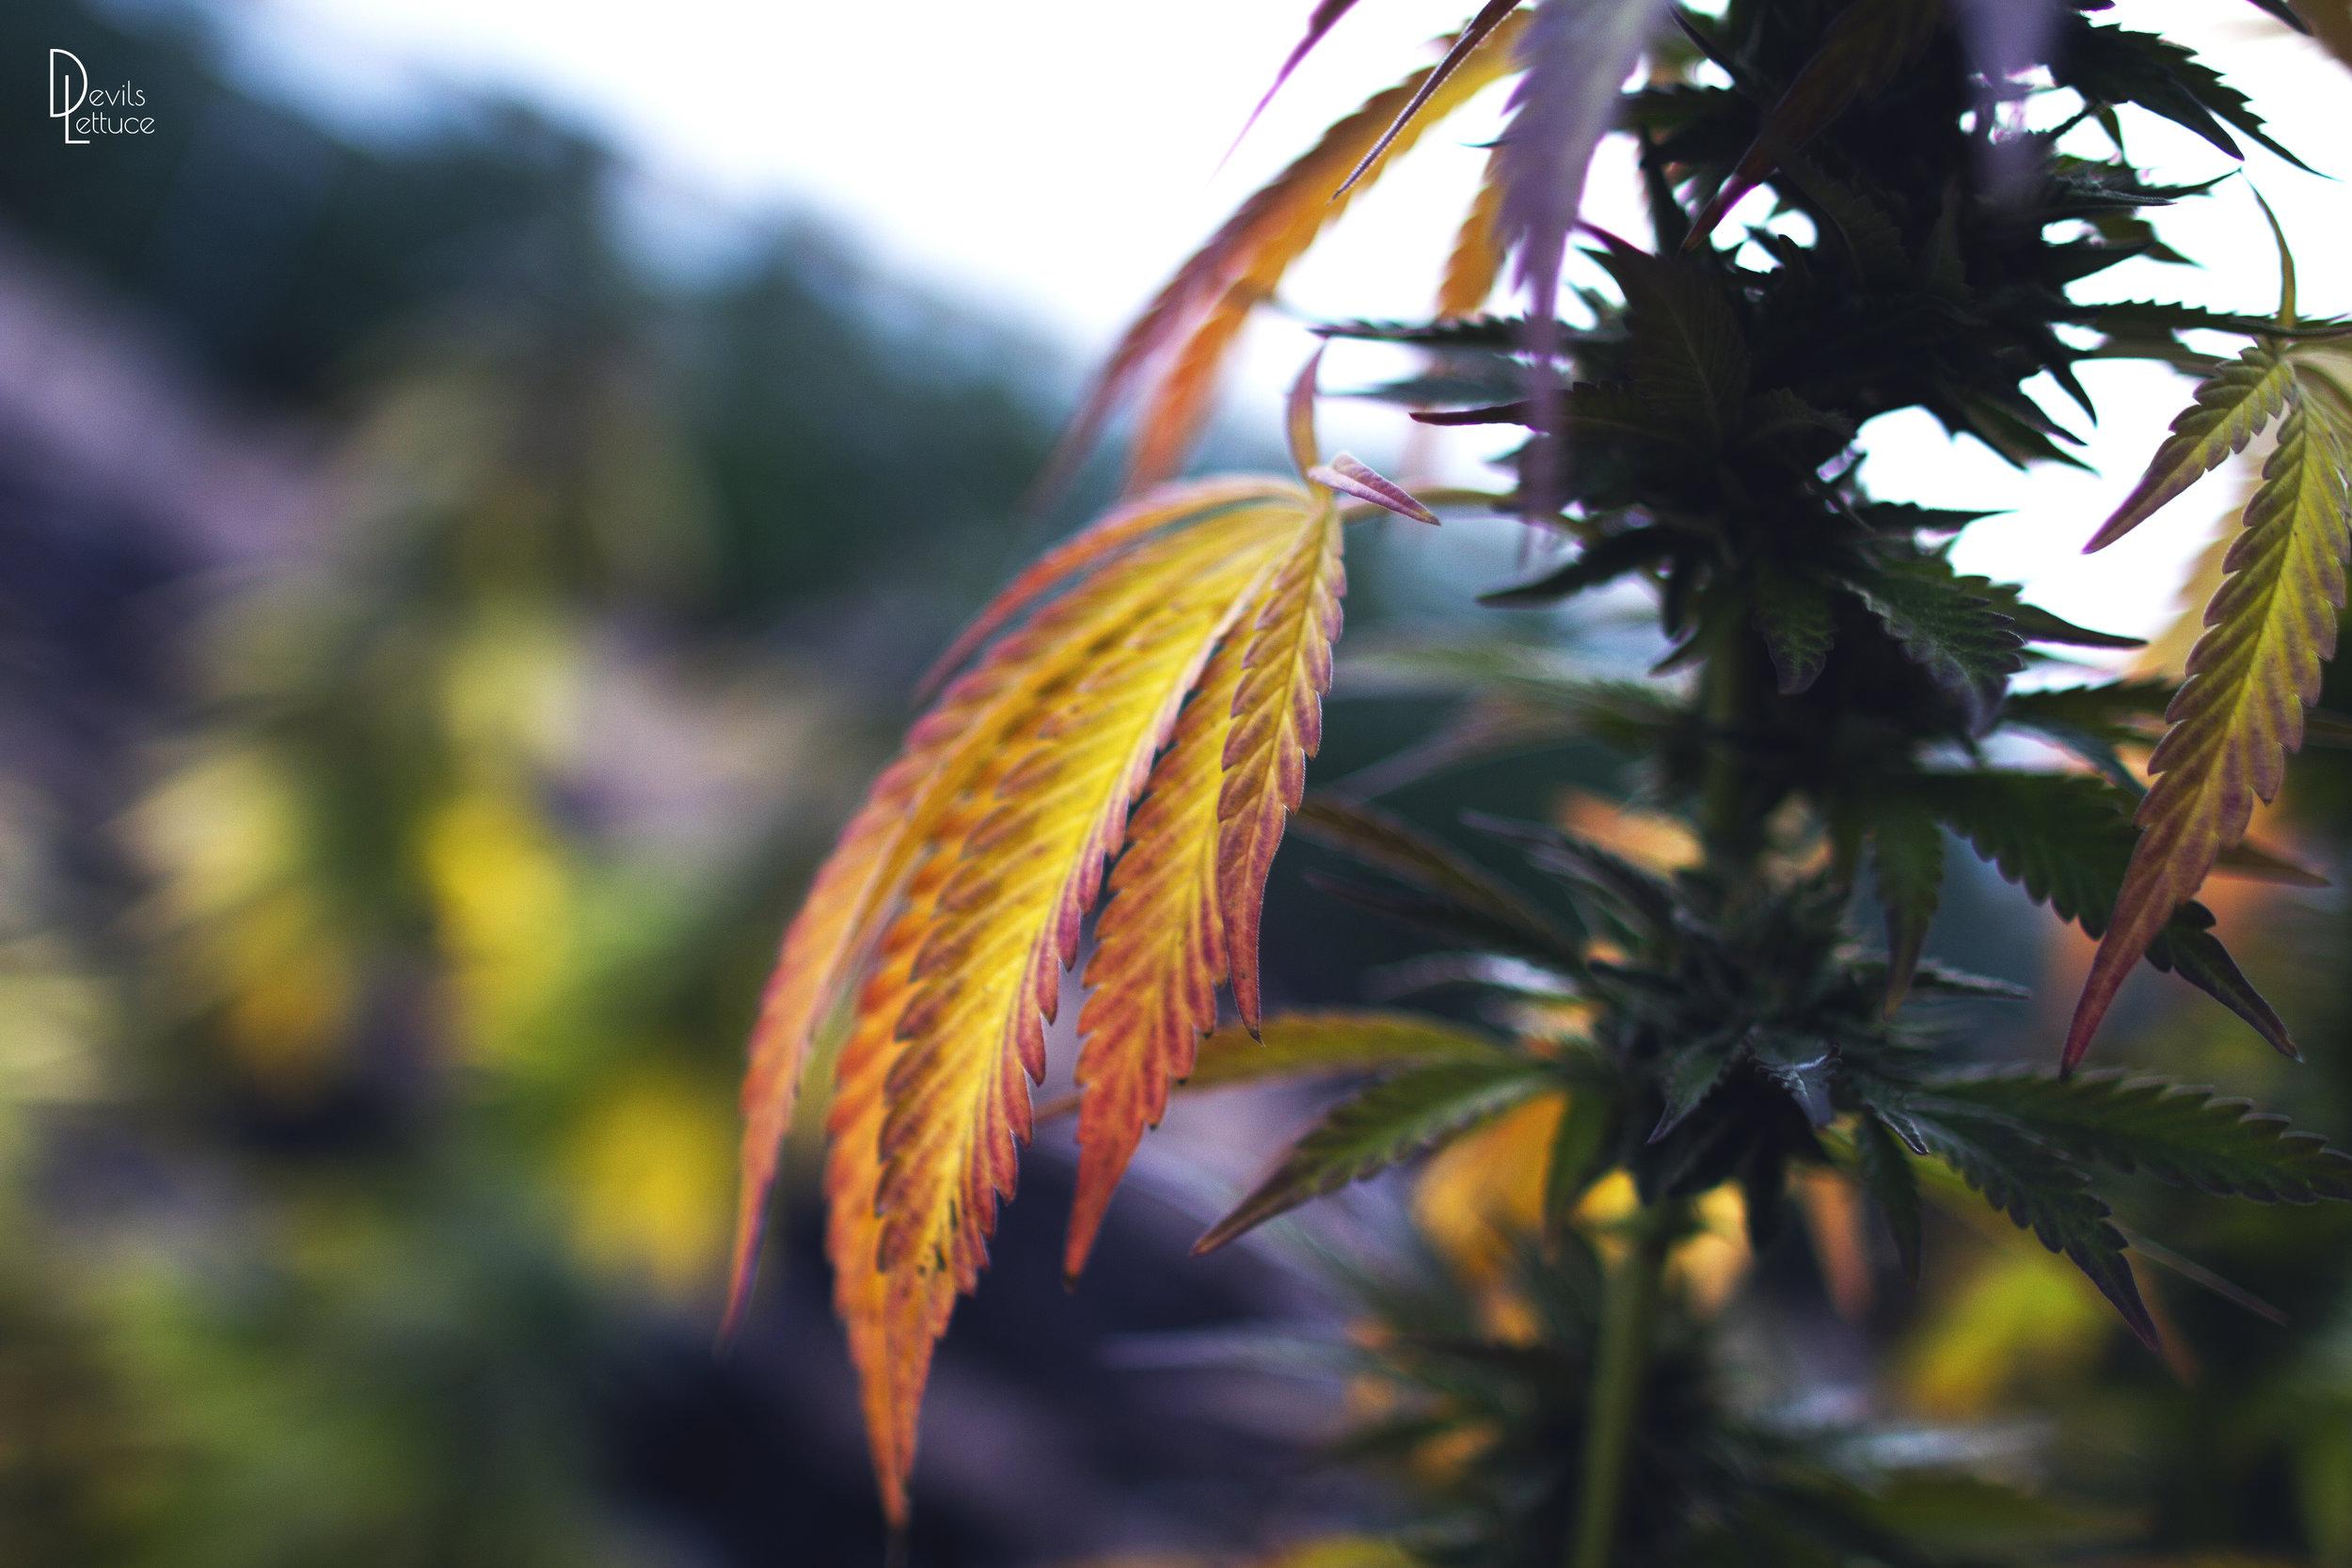 Goldleaf premium cannabis brand